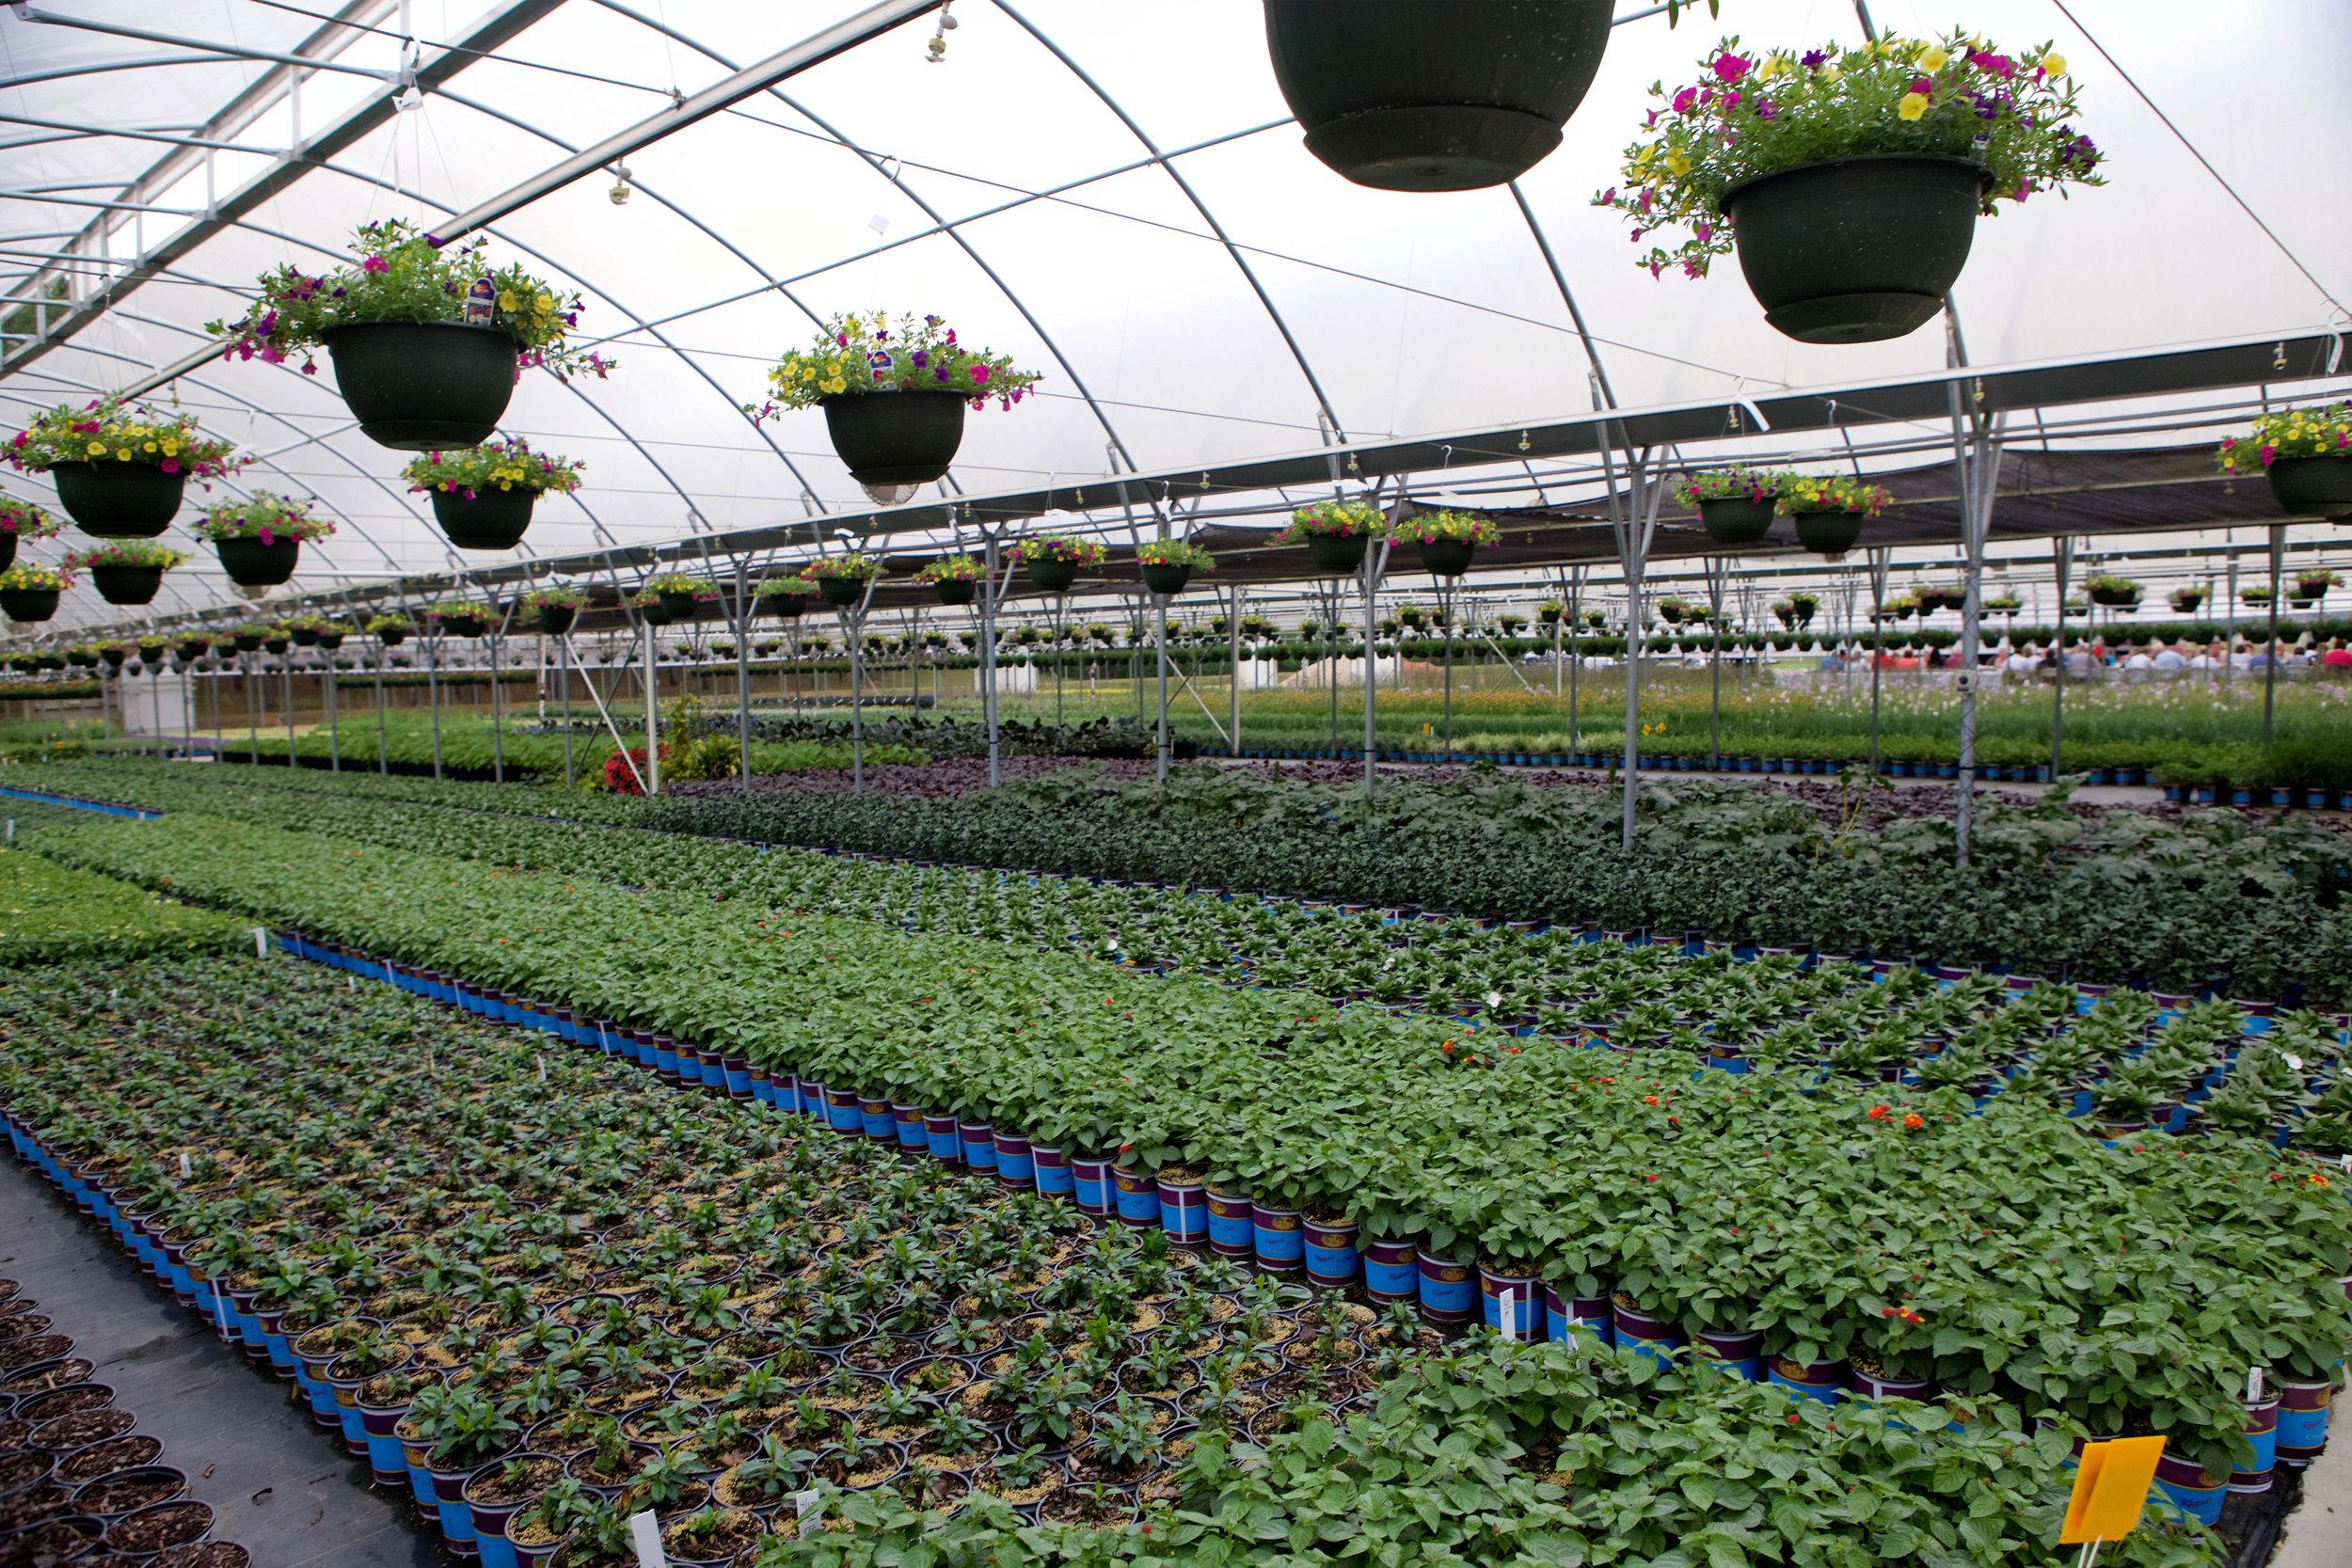 SquarespaceImage19-nursery-greenhouse.jpg